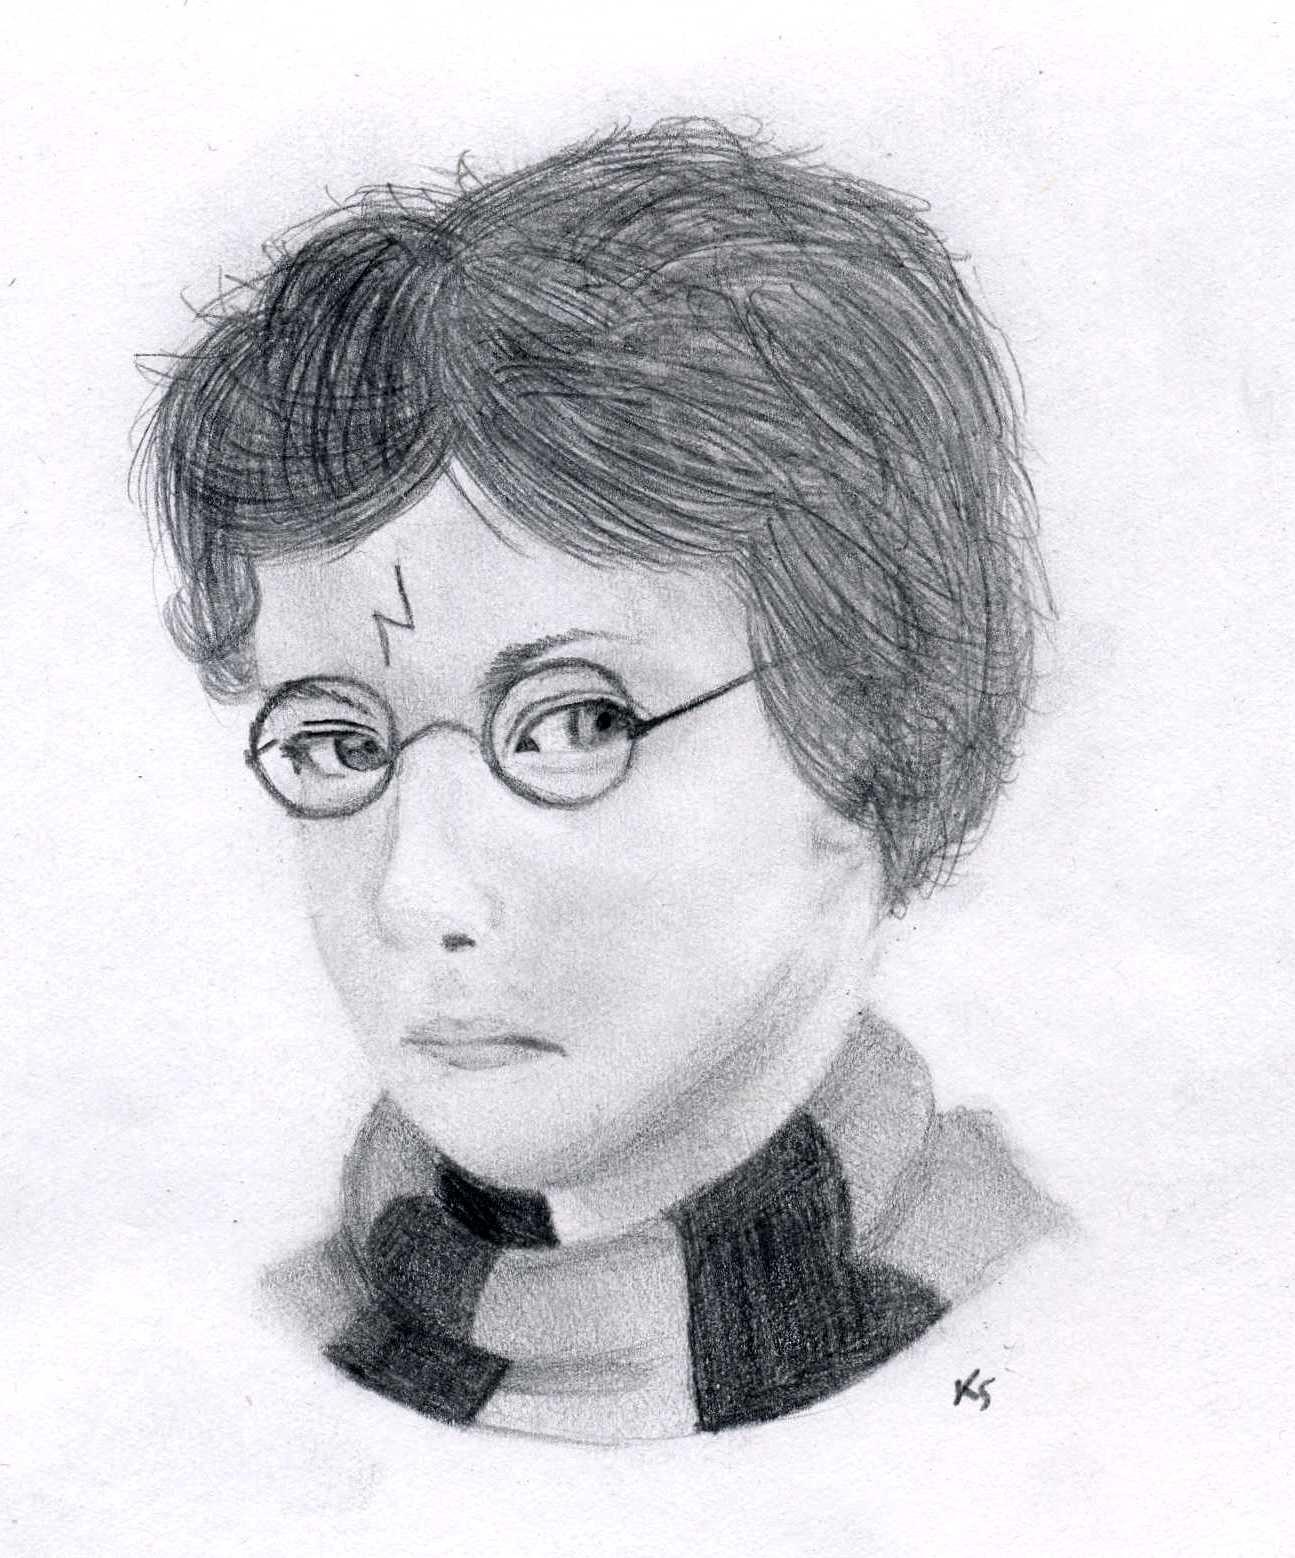 Harry James Potter-Evans-Verres: Dark Side